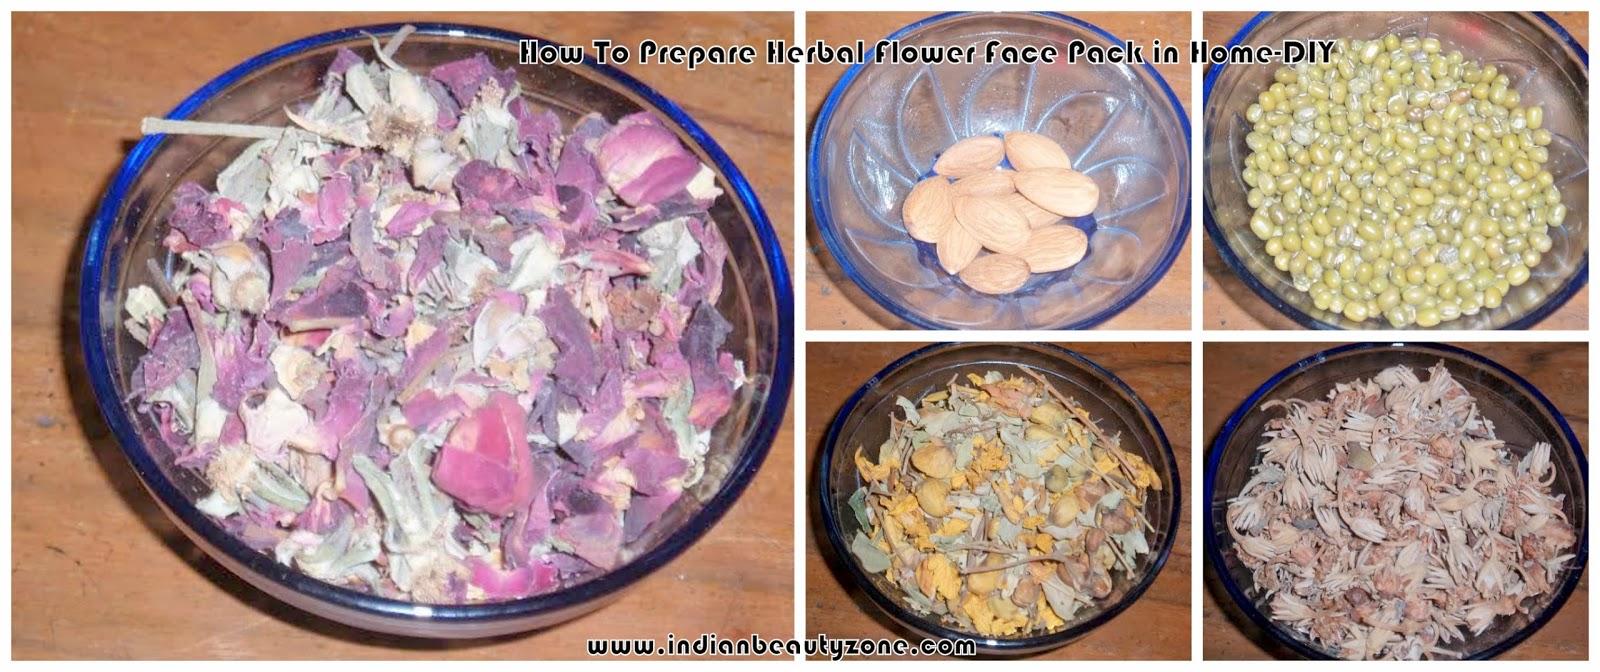 Herbal face pack for skin